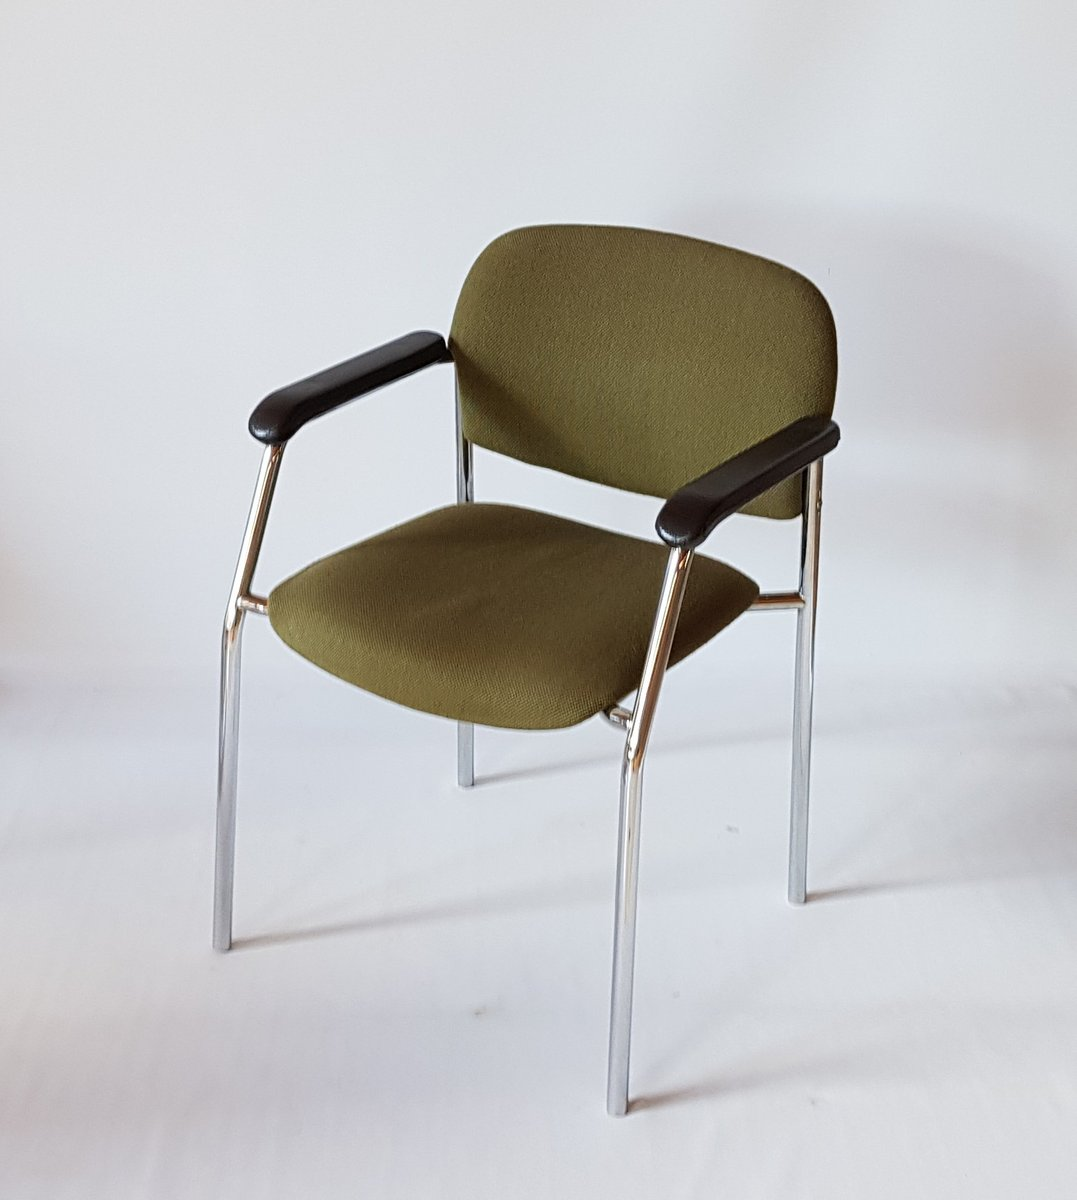 chaise verte de drabert 1970s - Chaise Verte